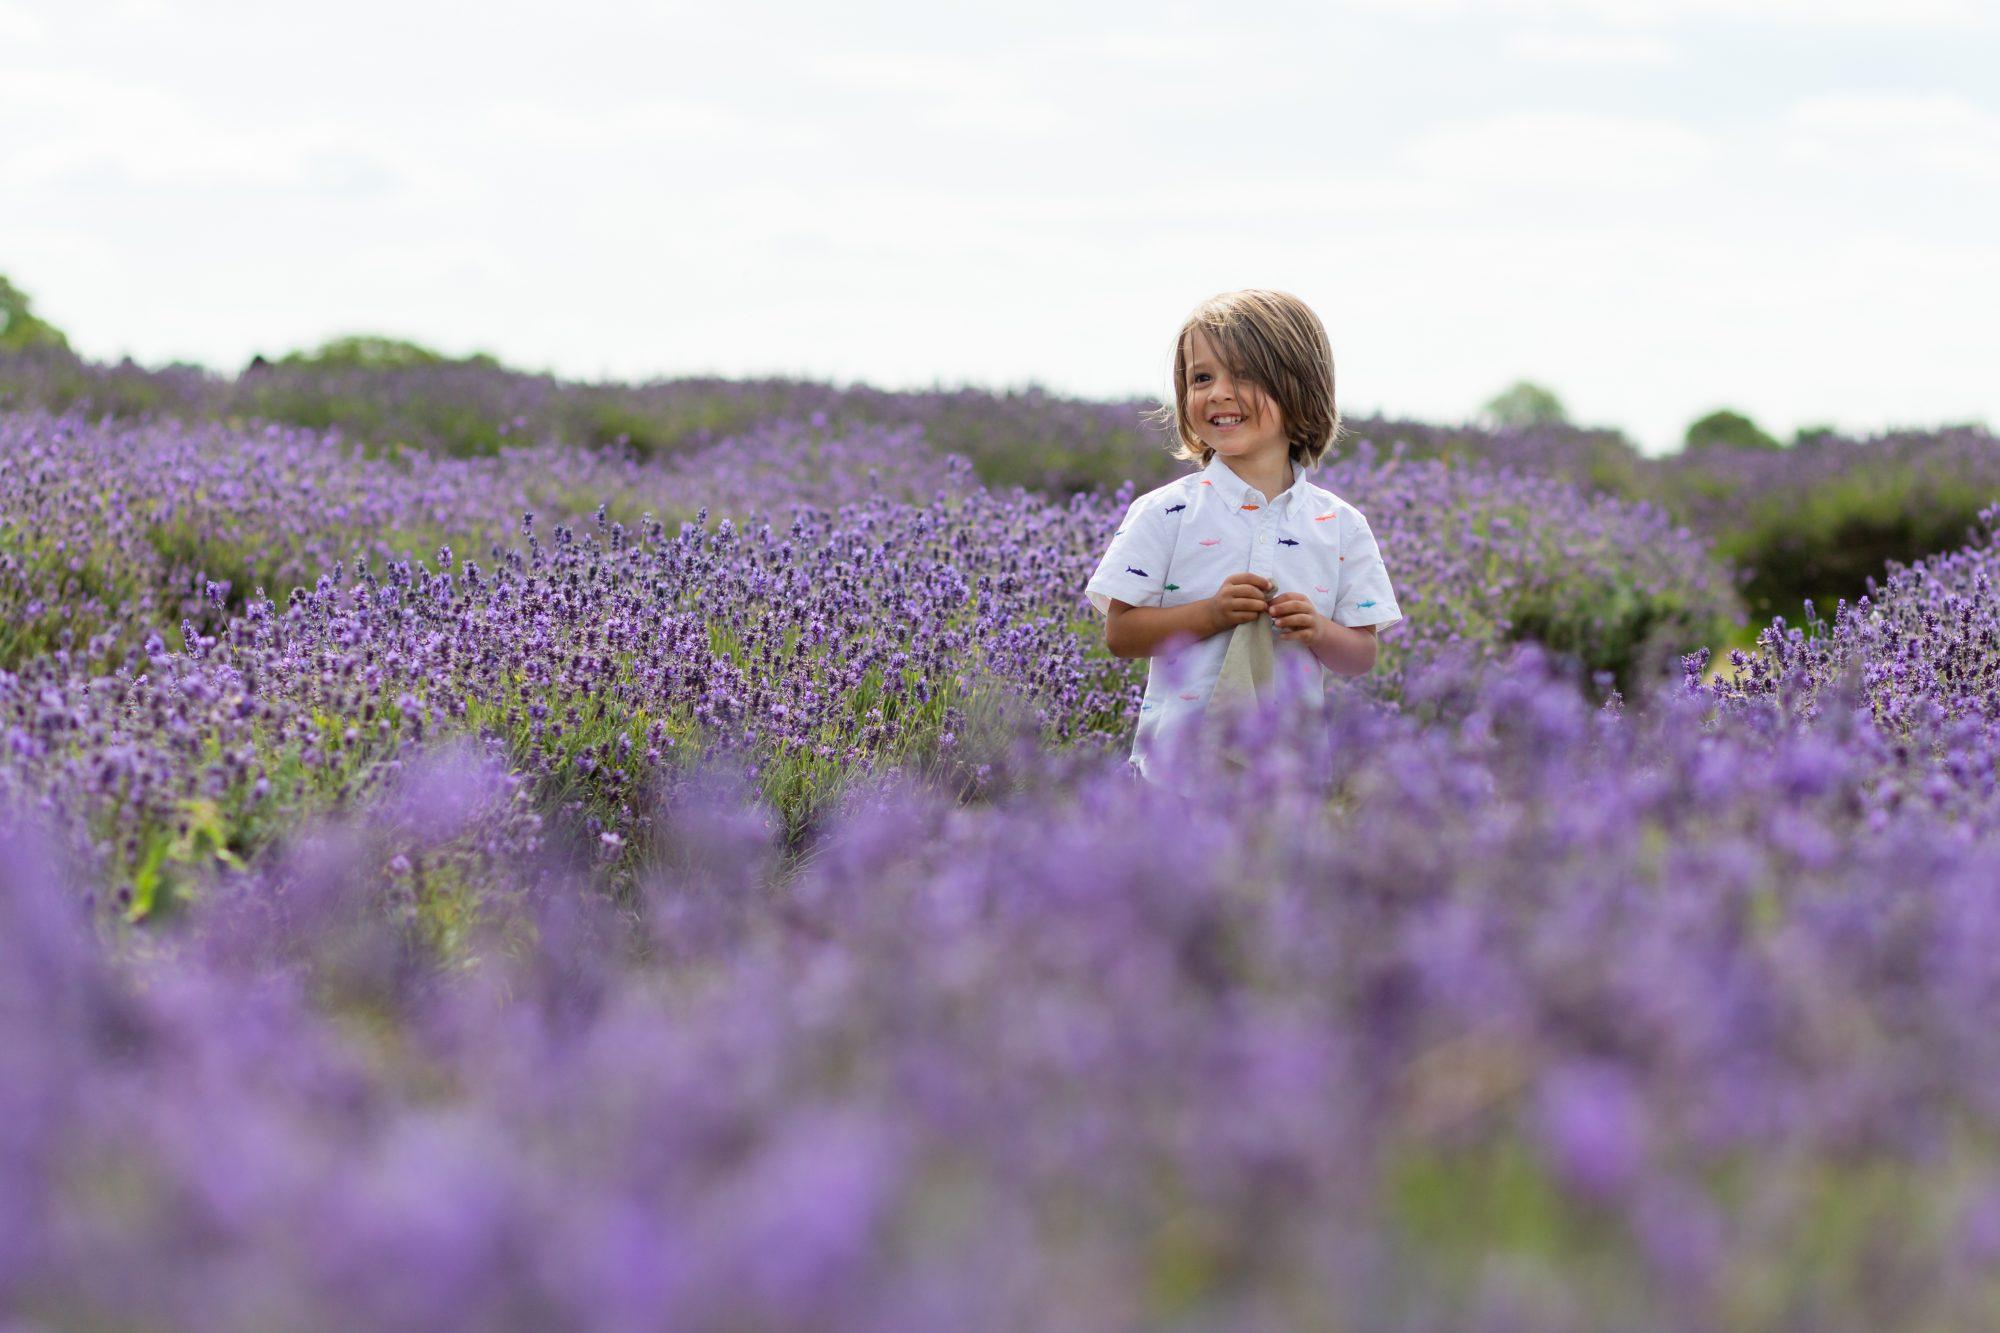 Lavender fields minishoot